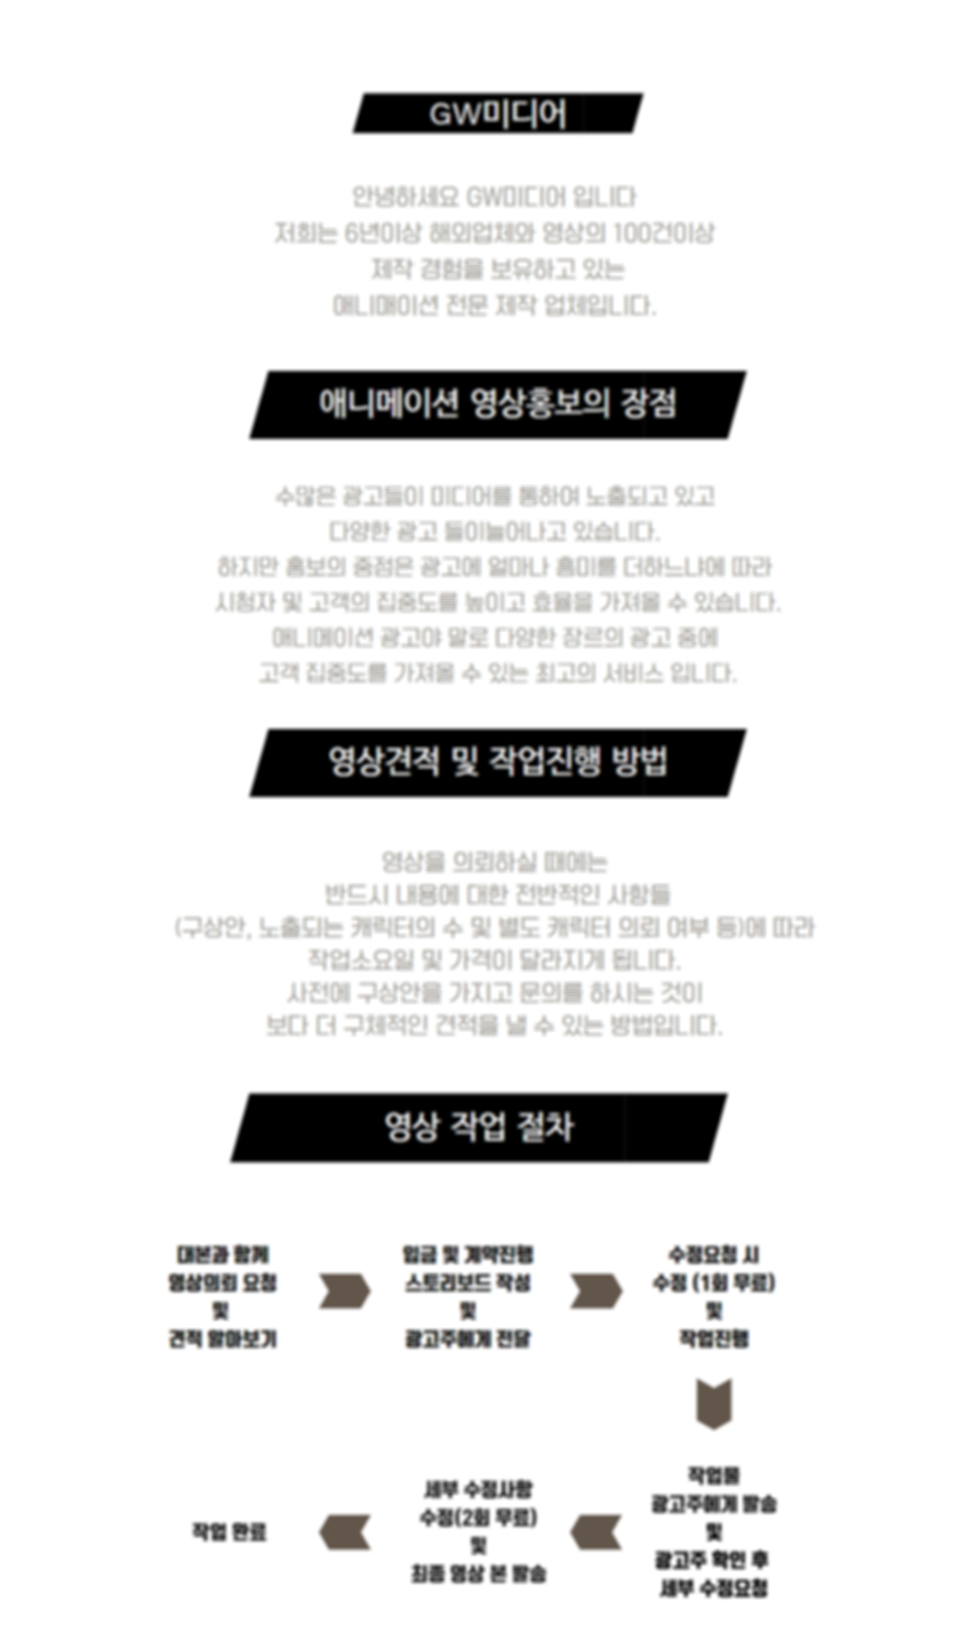 gw미디어 소개 (3).png